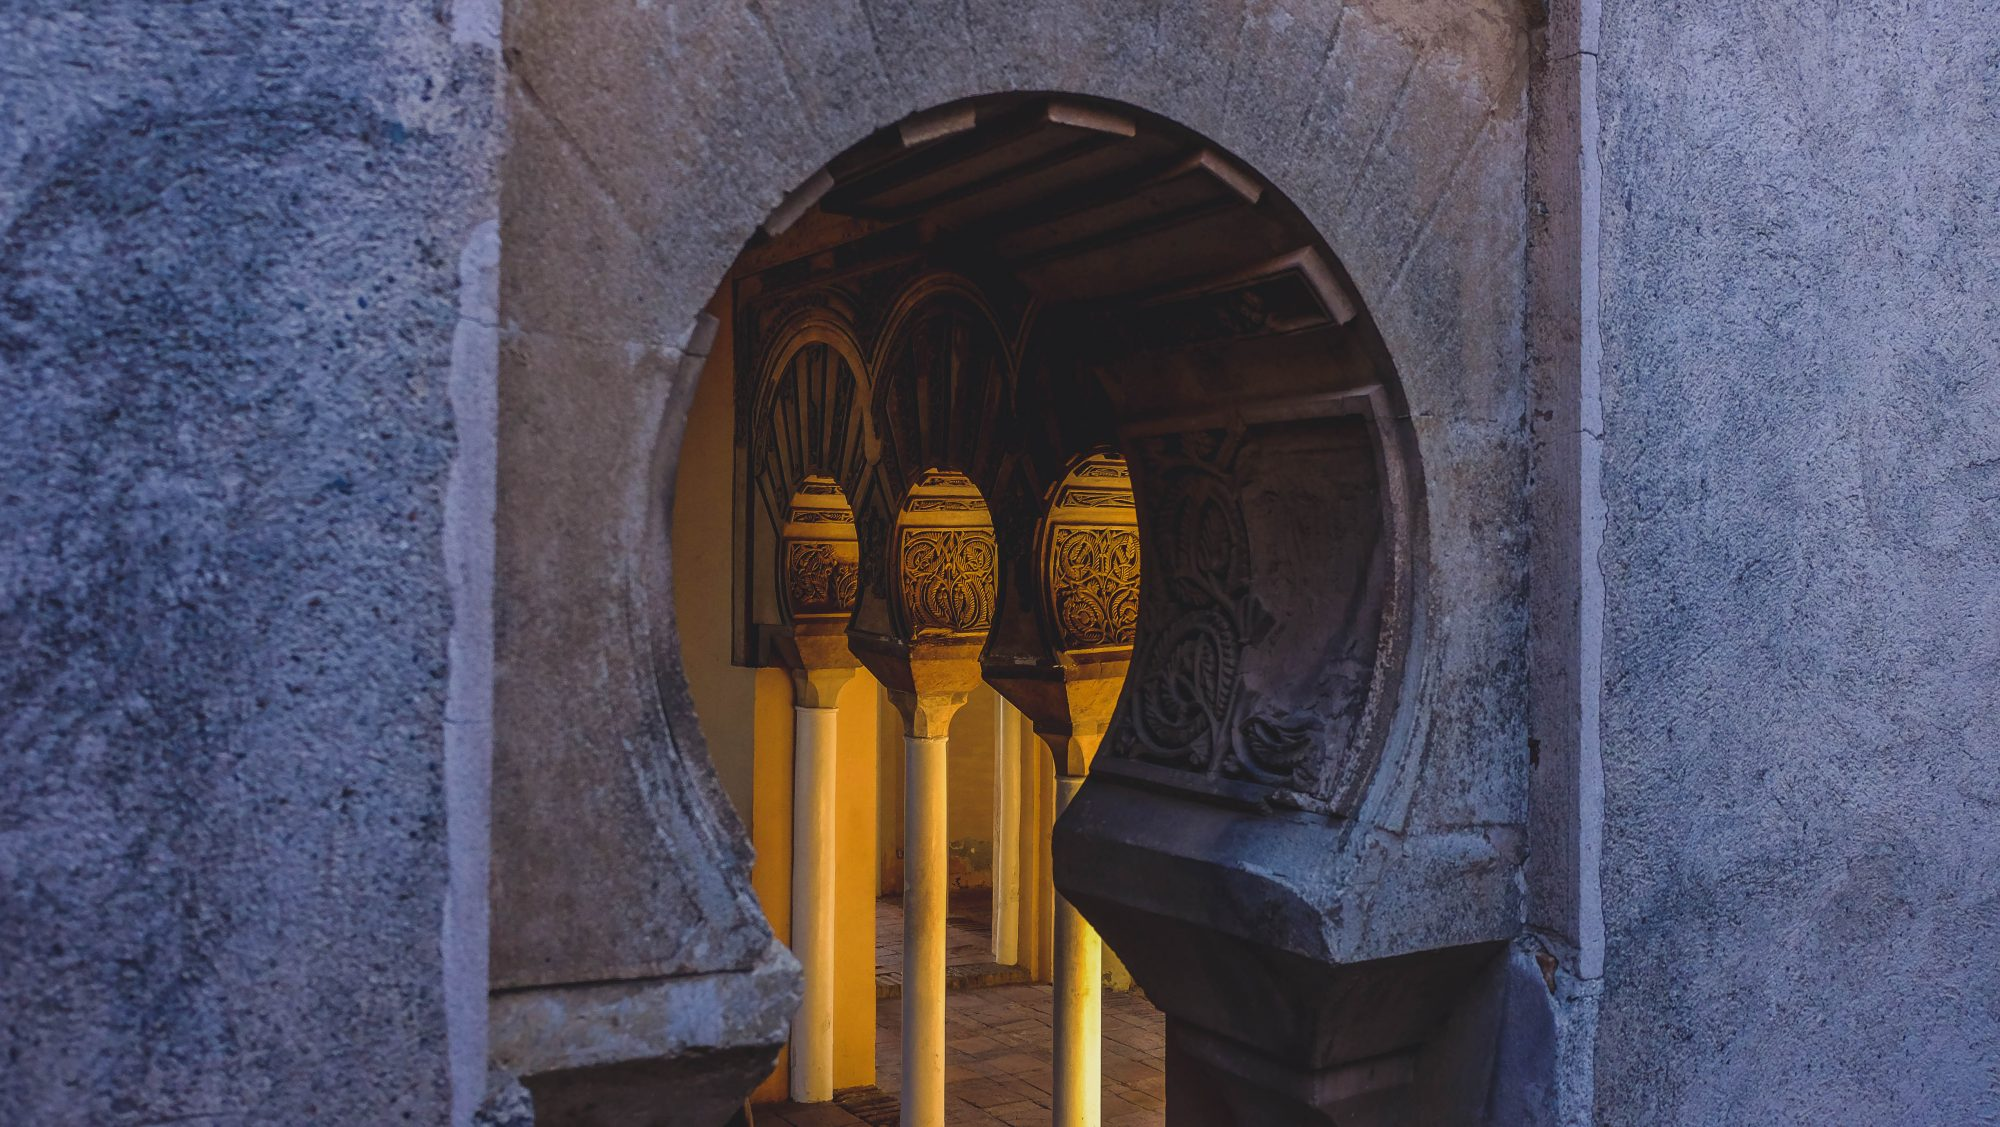 Jeu de lumières - Malaga, Espagne